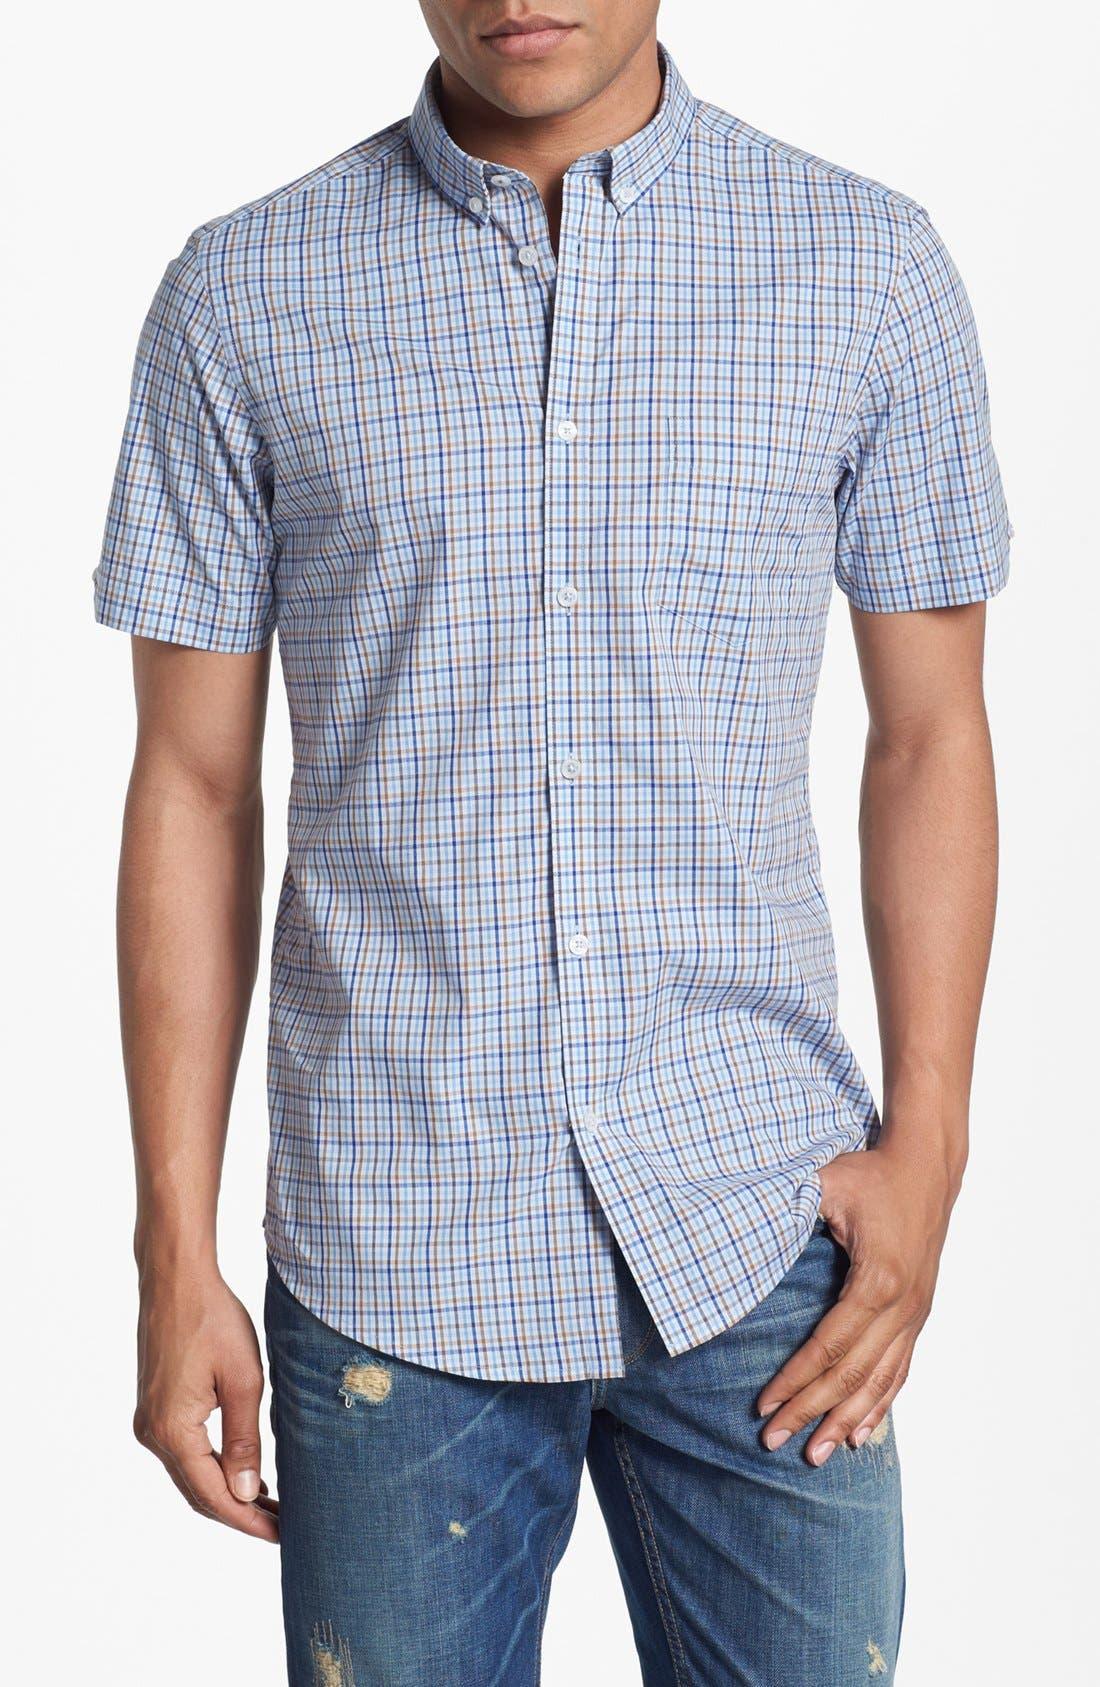 Alternate Image 1 Selected - Ben Sherman Check Short Sleeve Woven Shirt